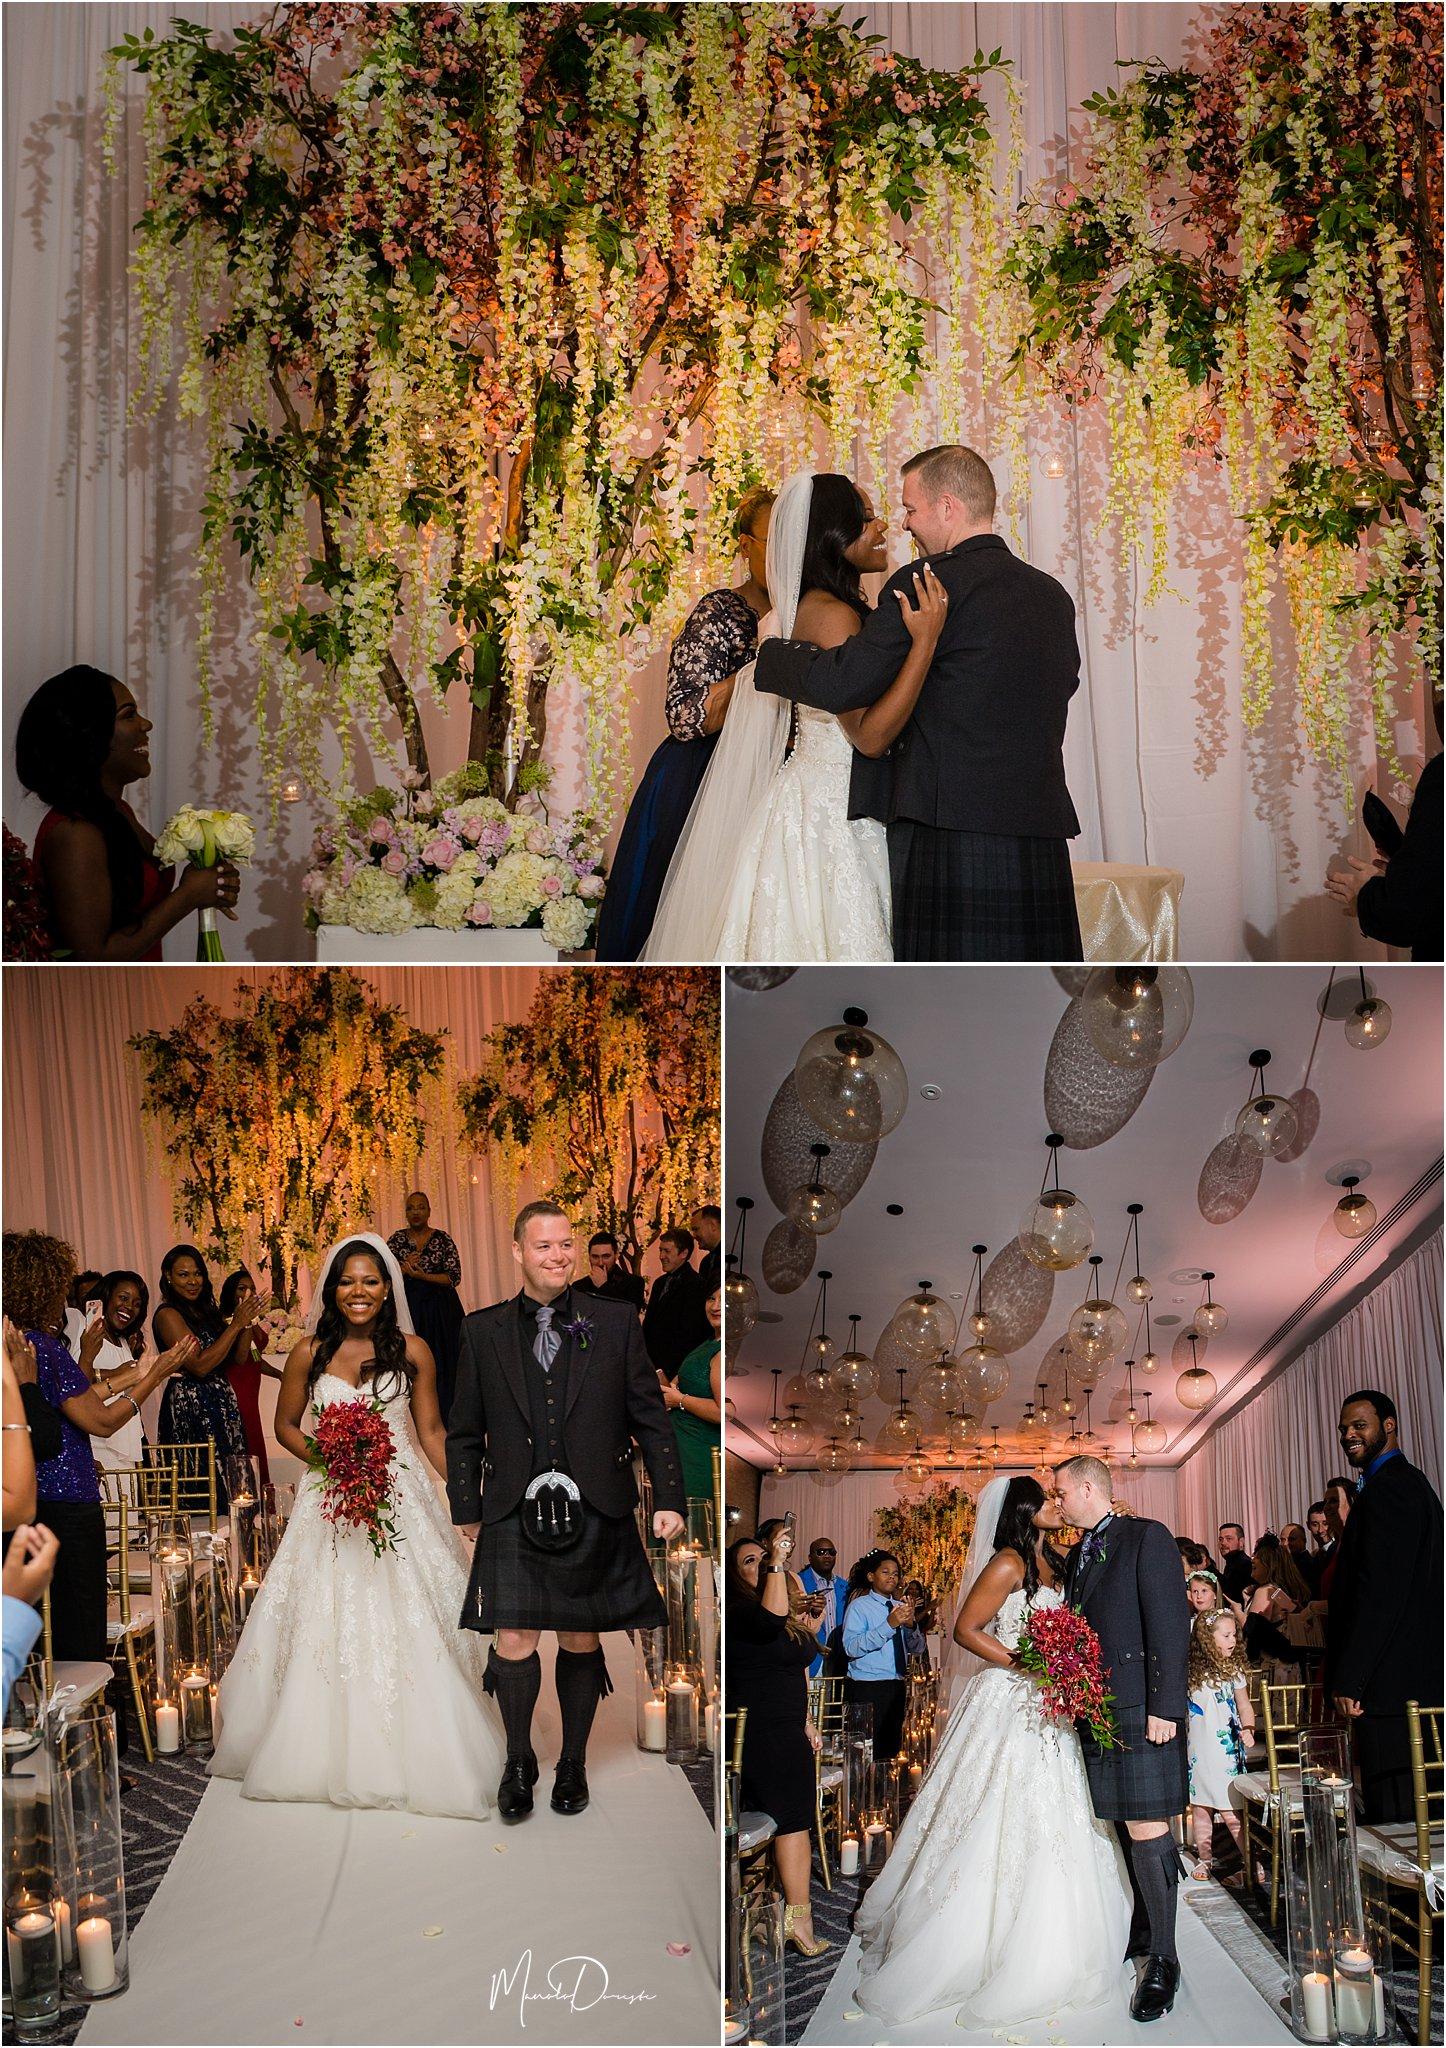 0121_ManoloDoreste_InFocusStudios_Wedding_Family_Photography_Miami_MiamiPhotographer.jpg